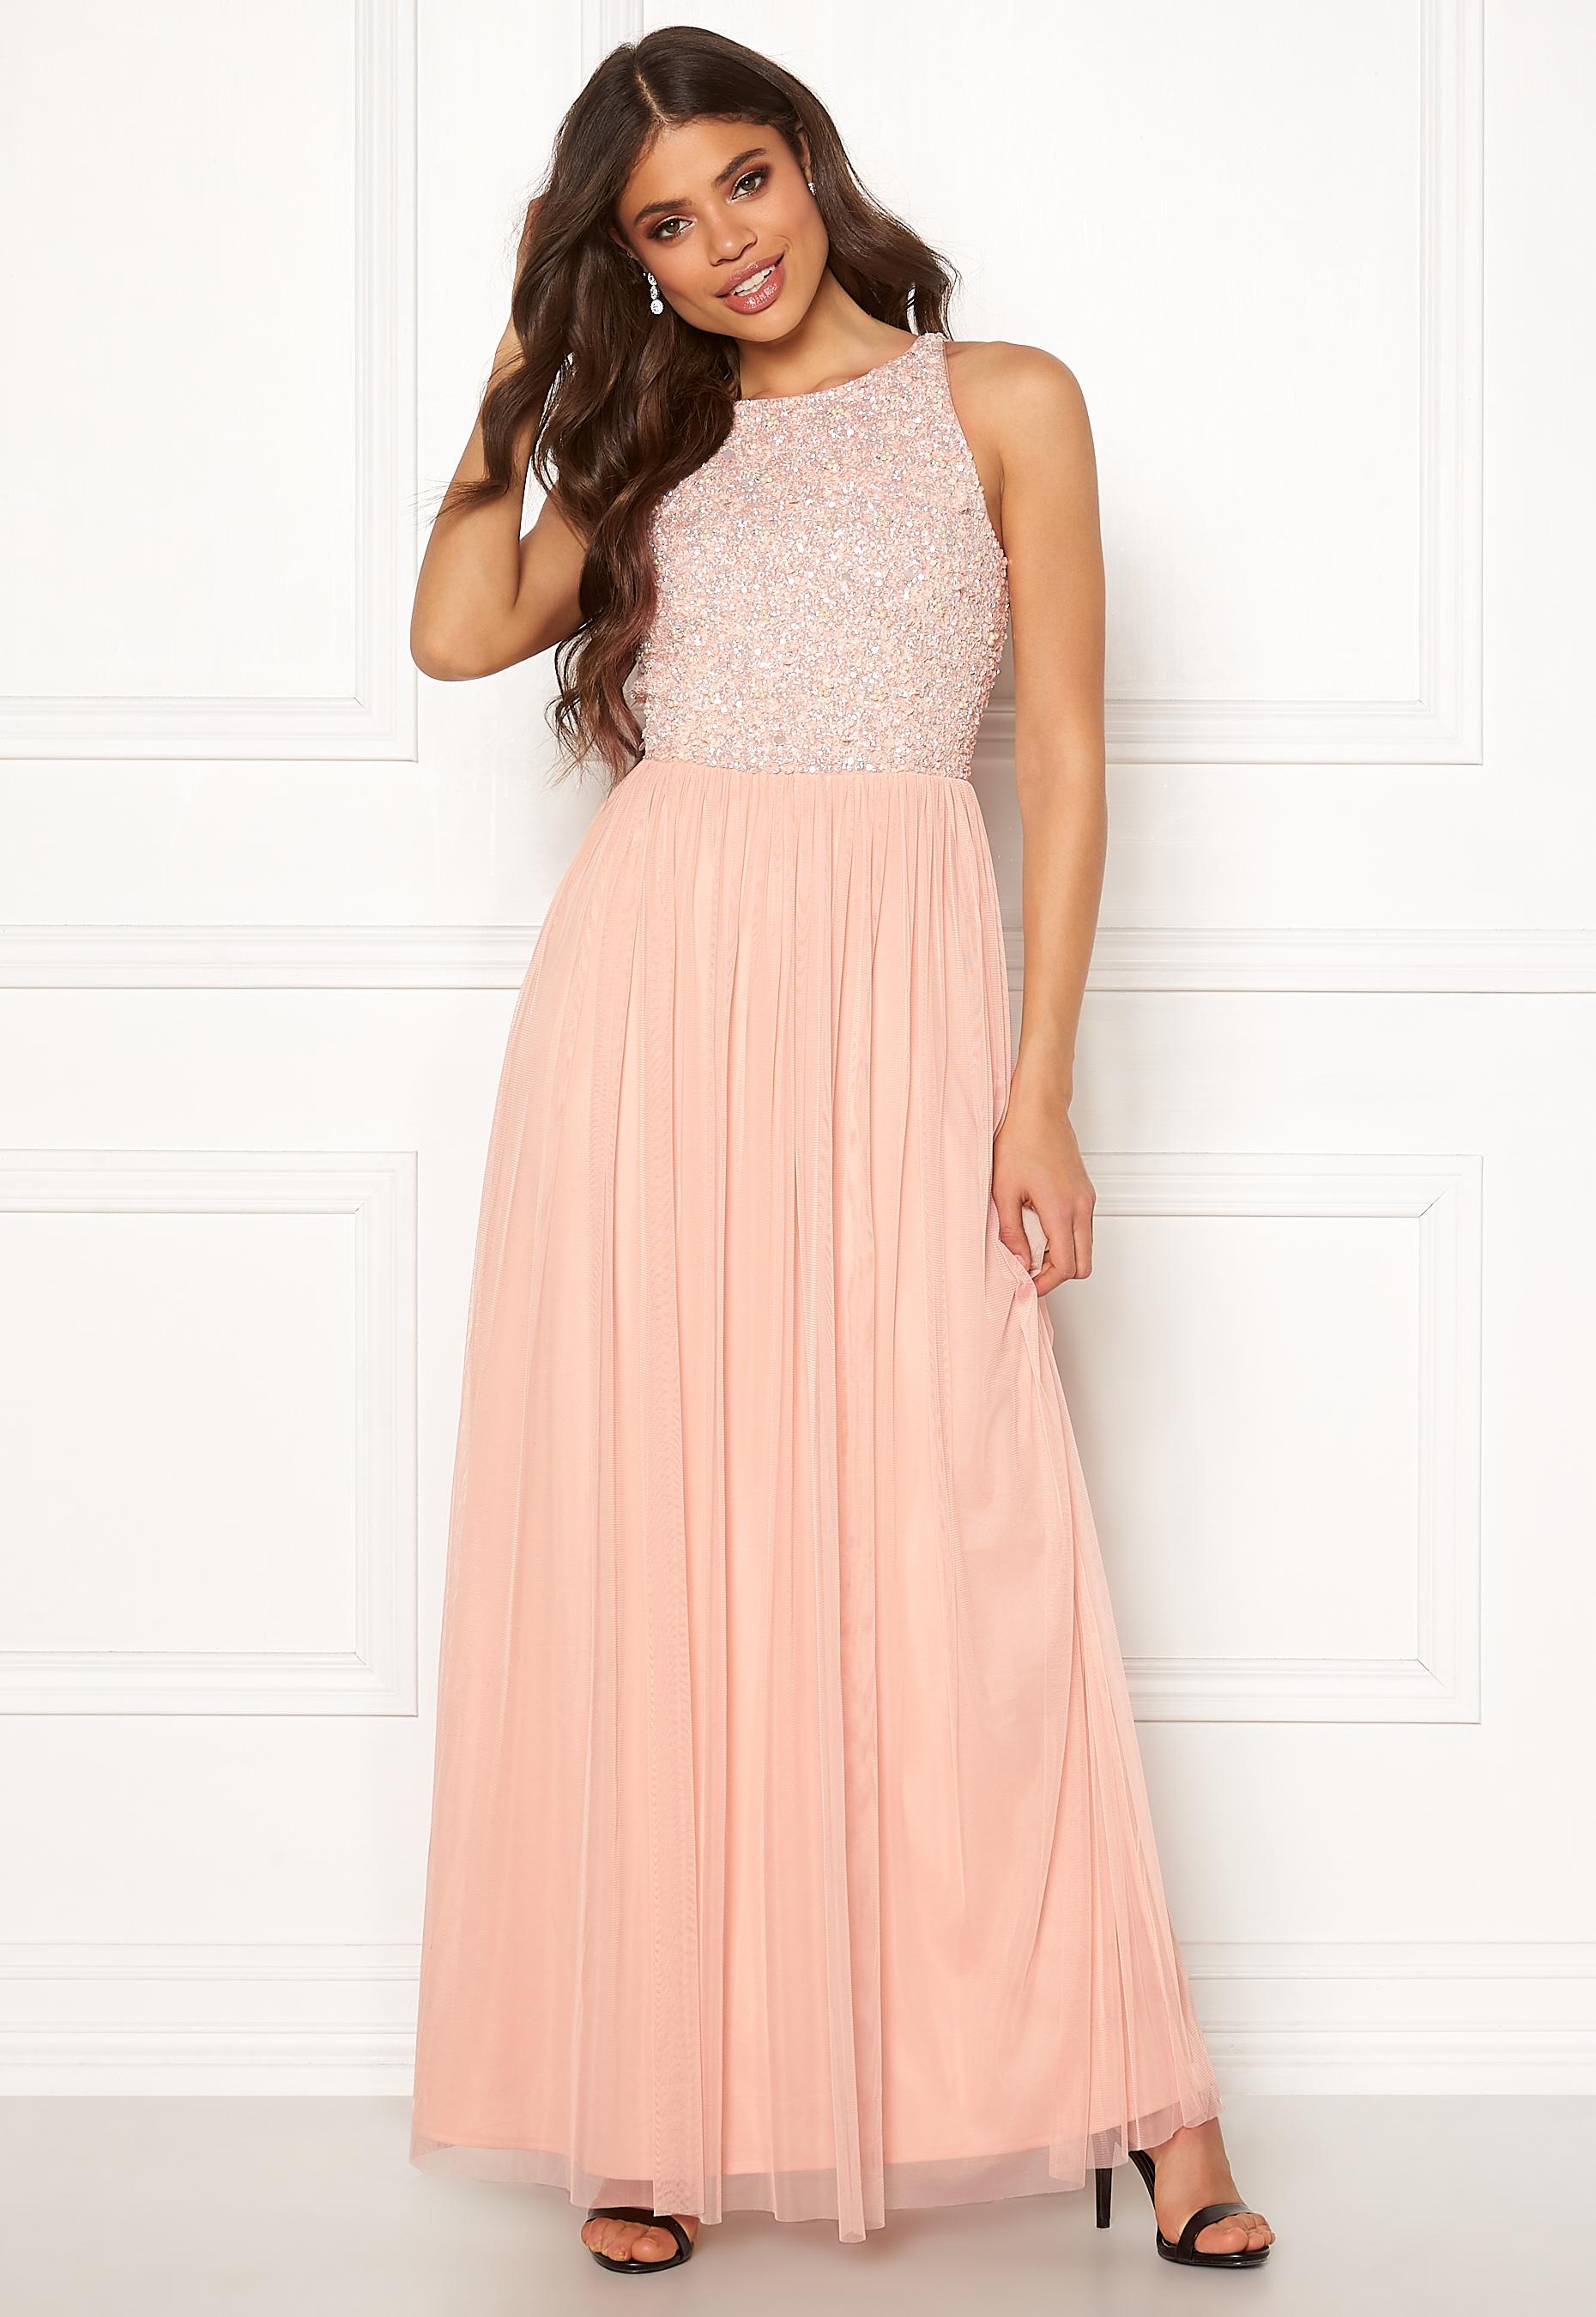 8a8052ded8bb AngelEye Sleeveless Bodice Dress Nude - Bubbleroom